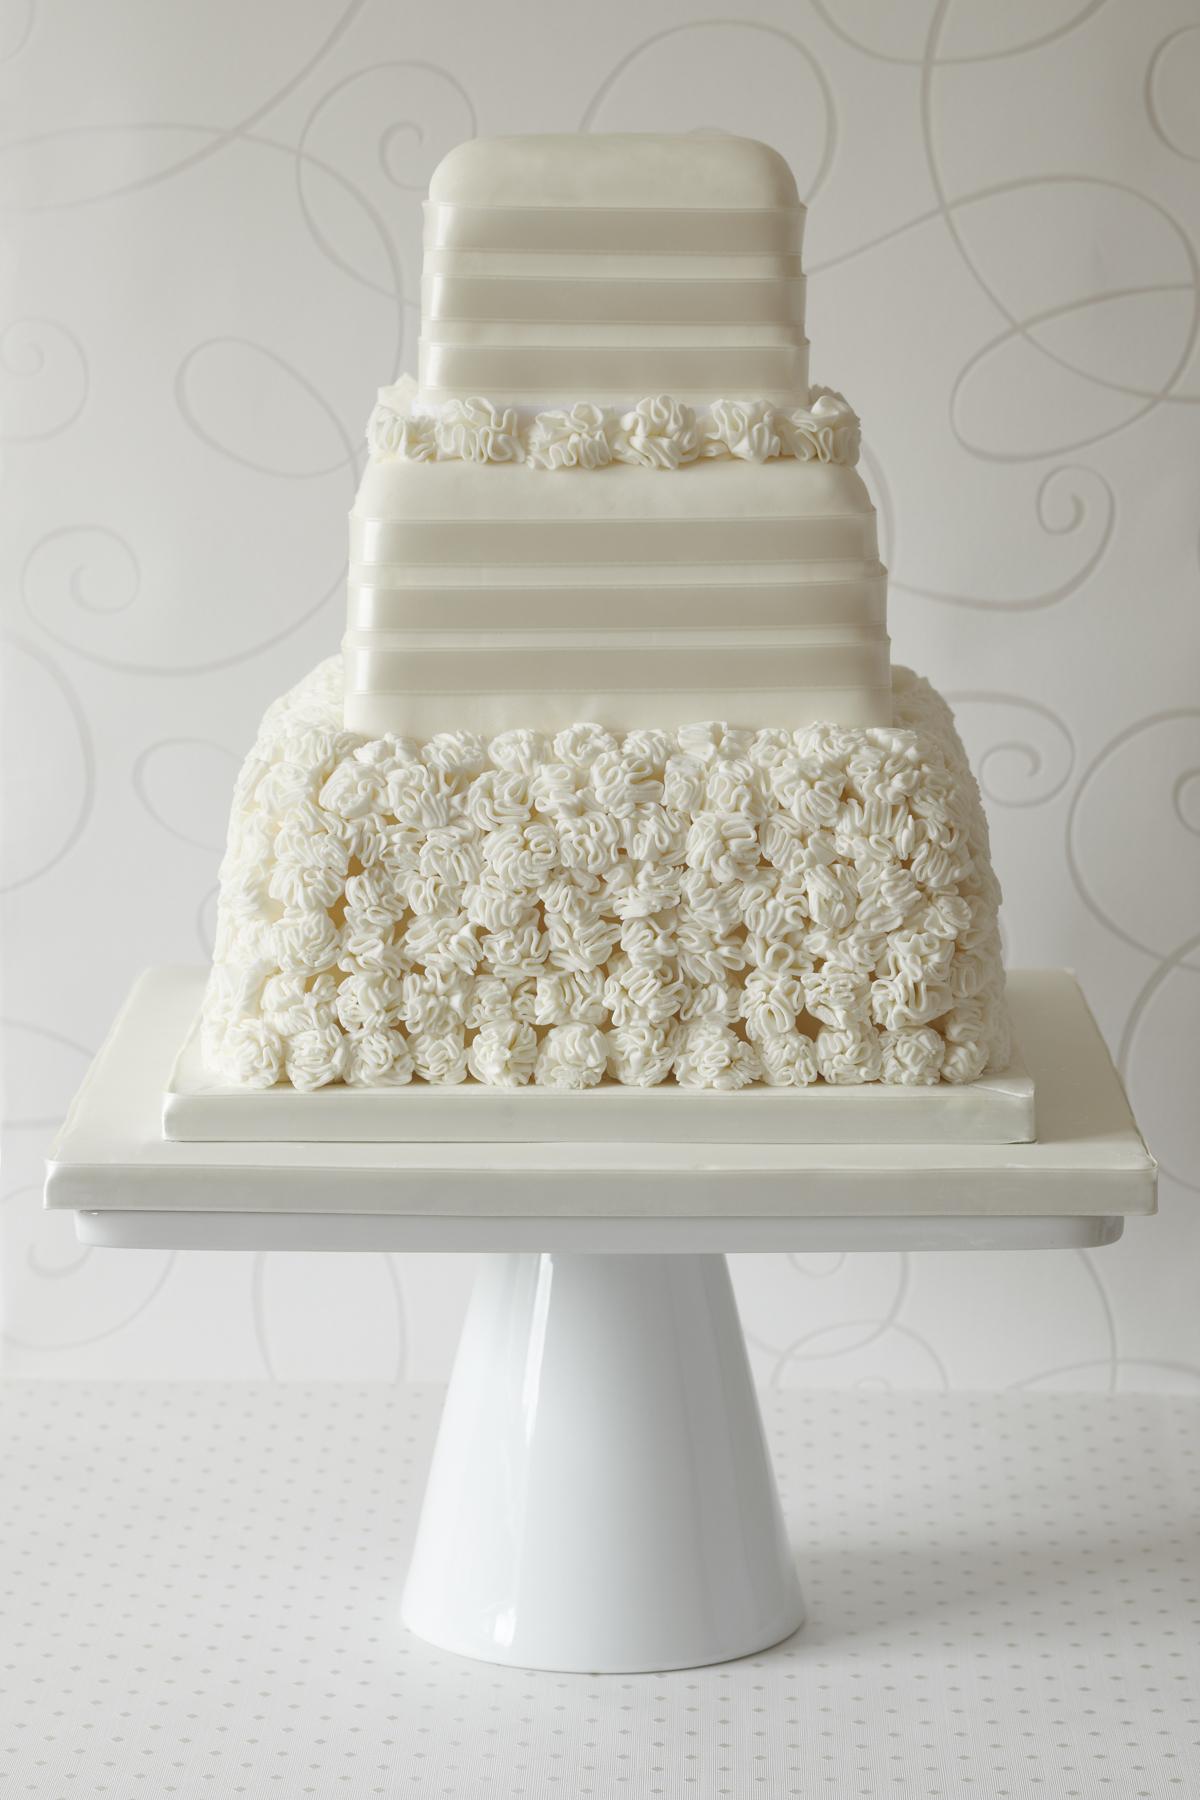 La Traviata wedding cake